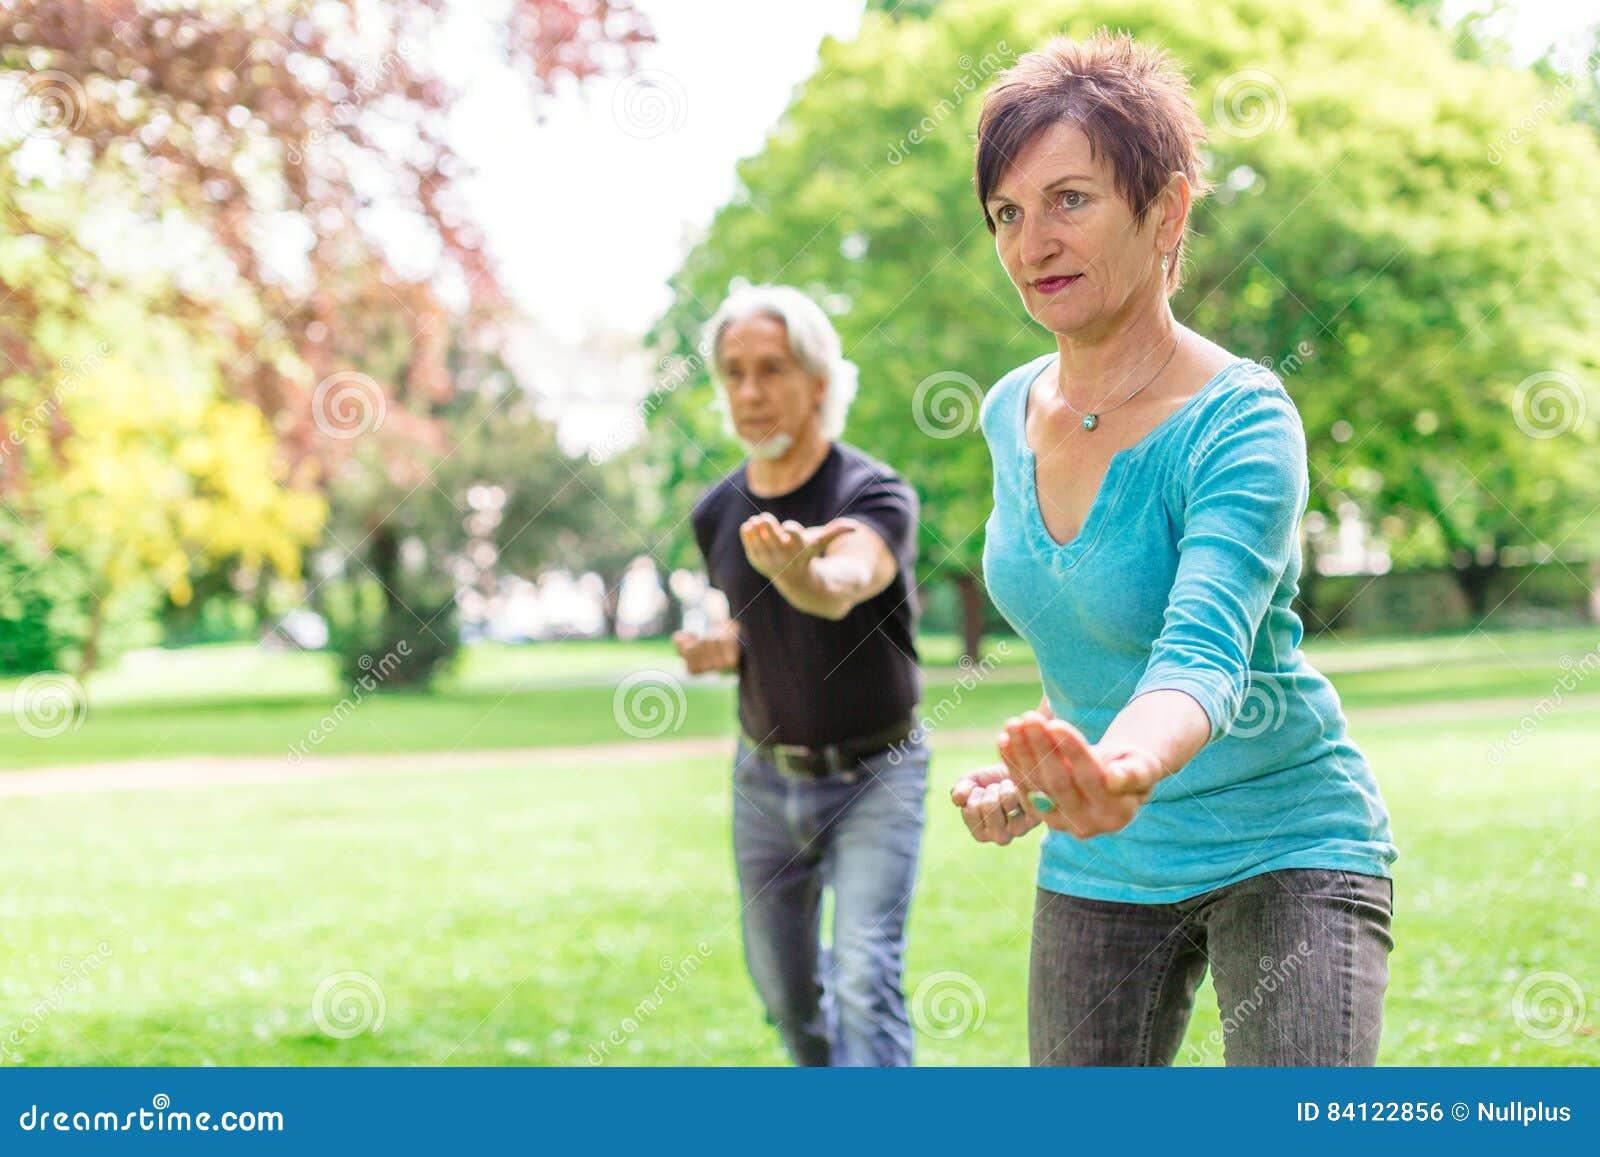 Senior Couple Doing Tai Chi In Park, Tuebingen, Germany